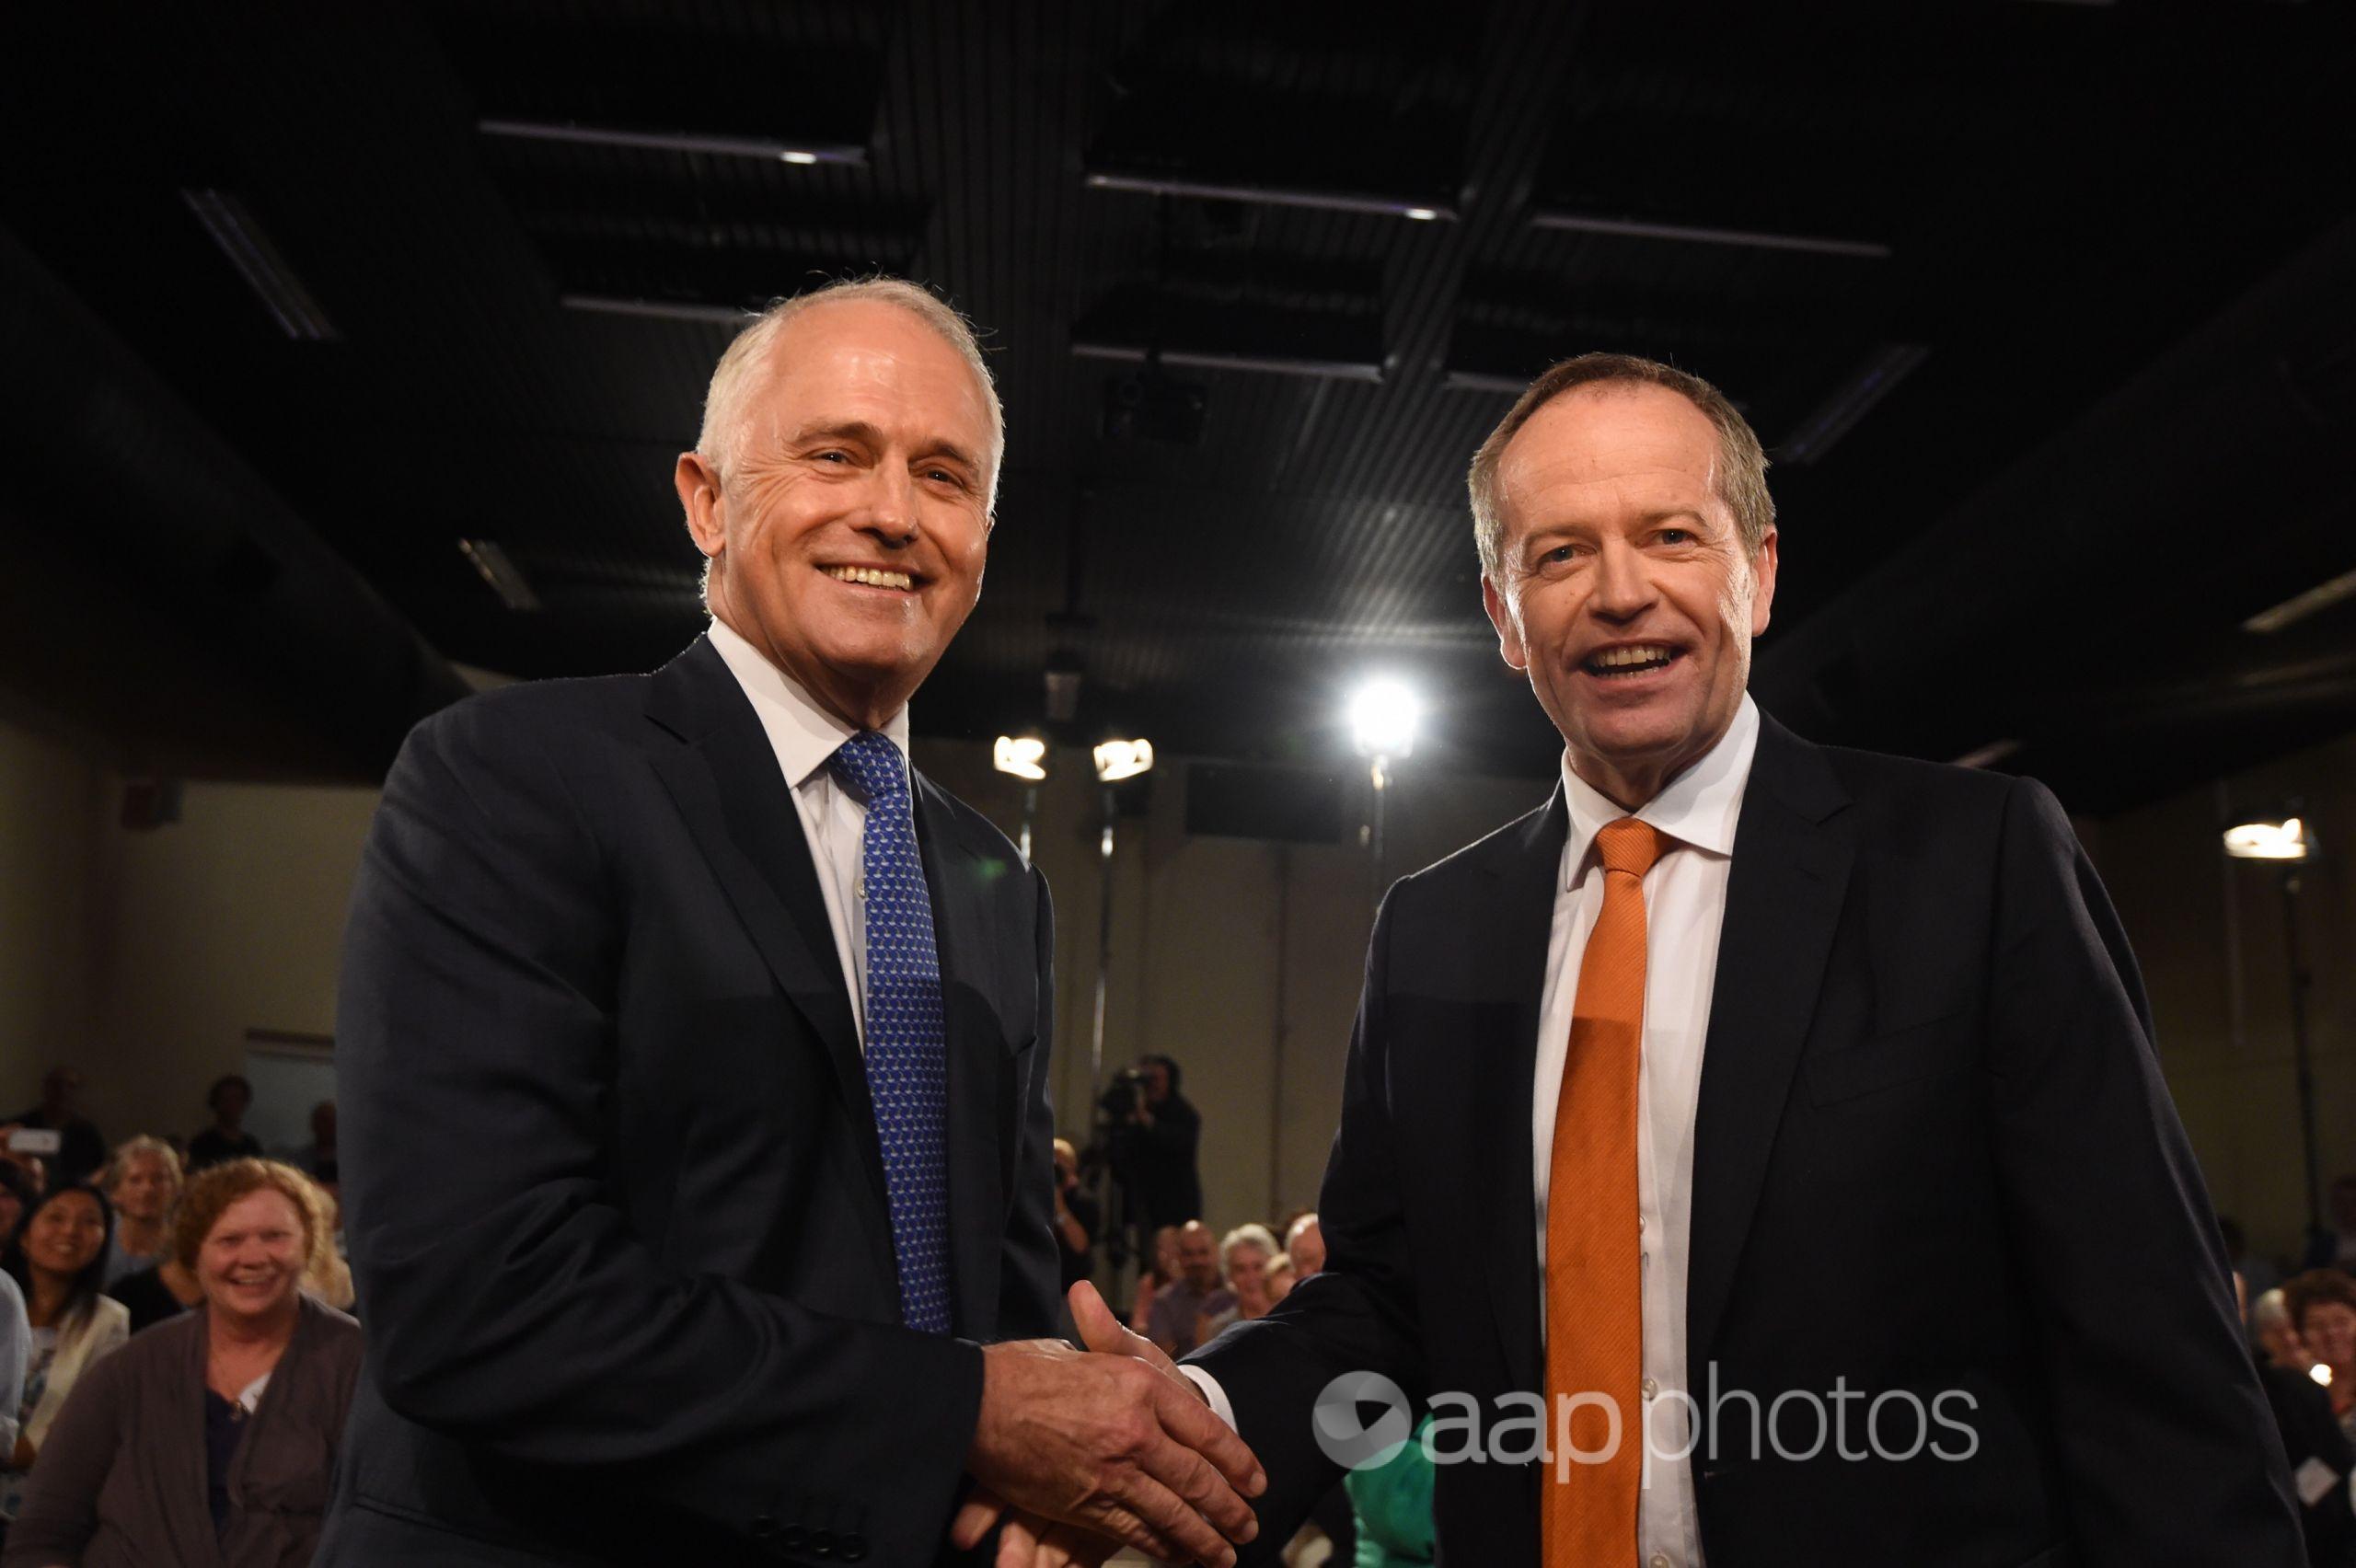 Malcolm Turnbull and Bill Shorten